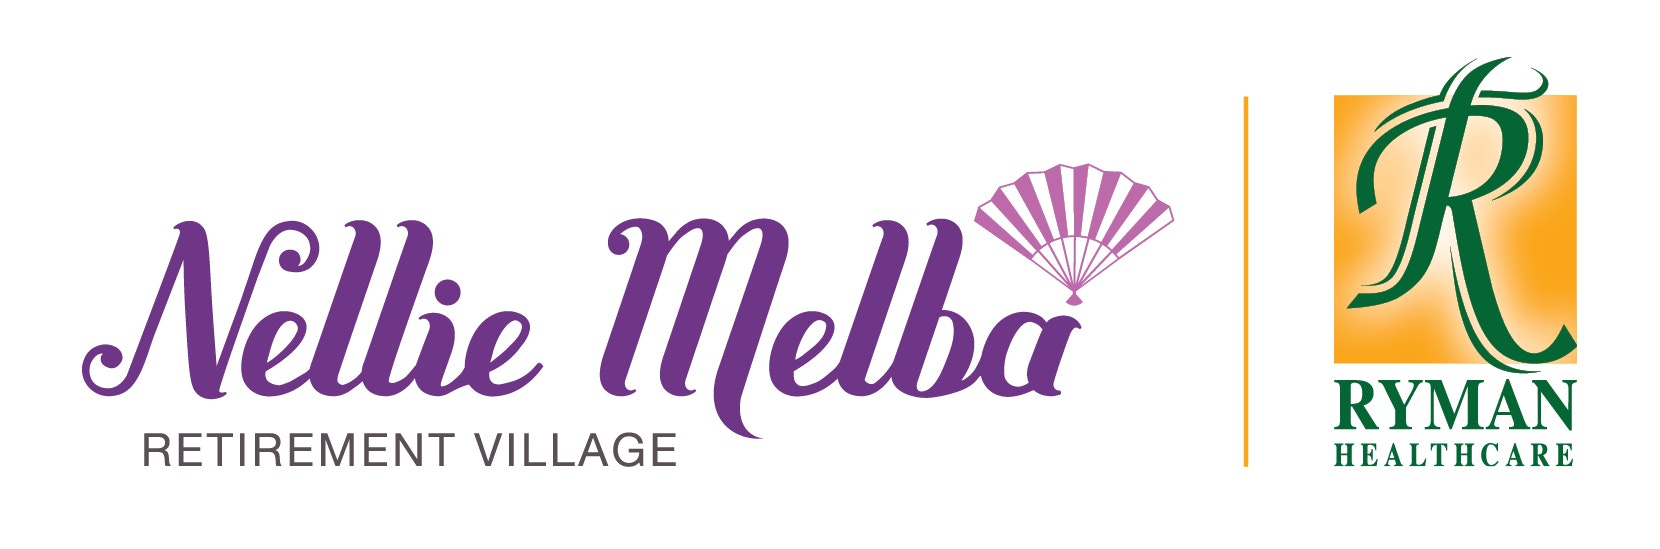 Nellie Melba Retirement Village logo